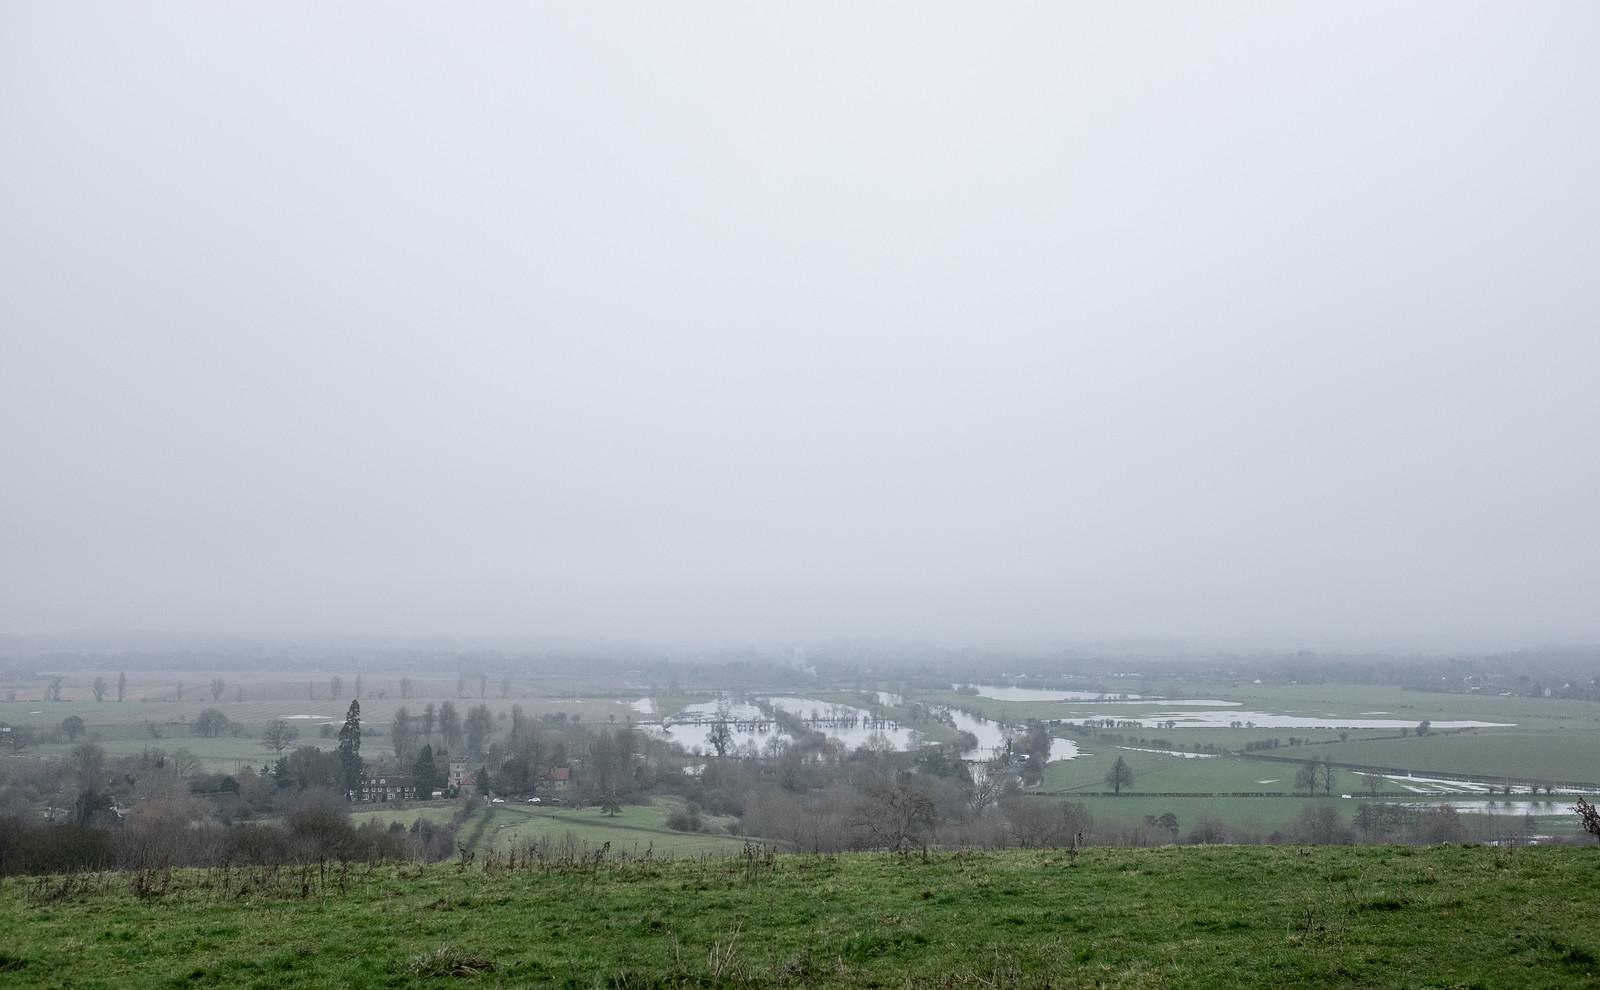 It's a bit gray today